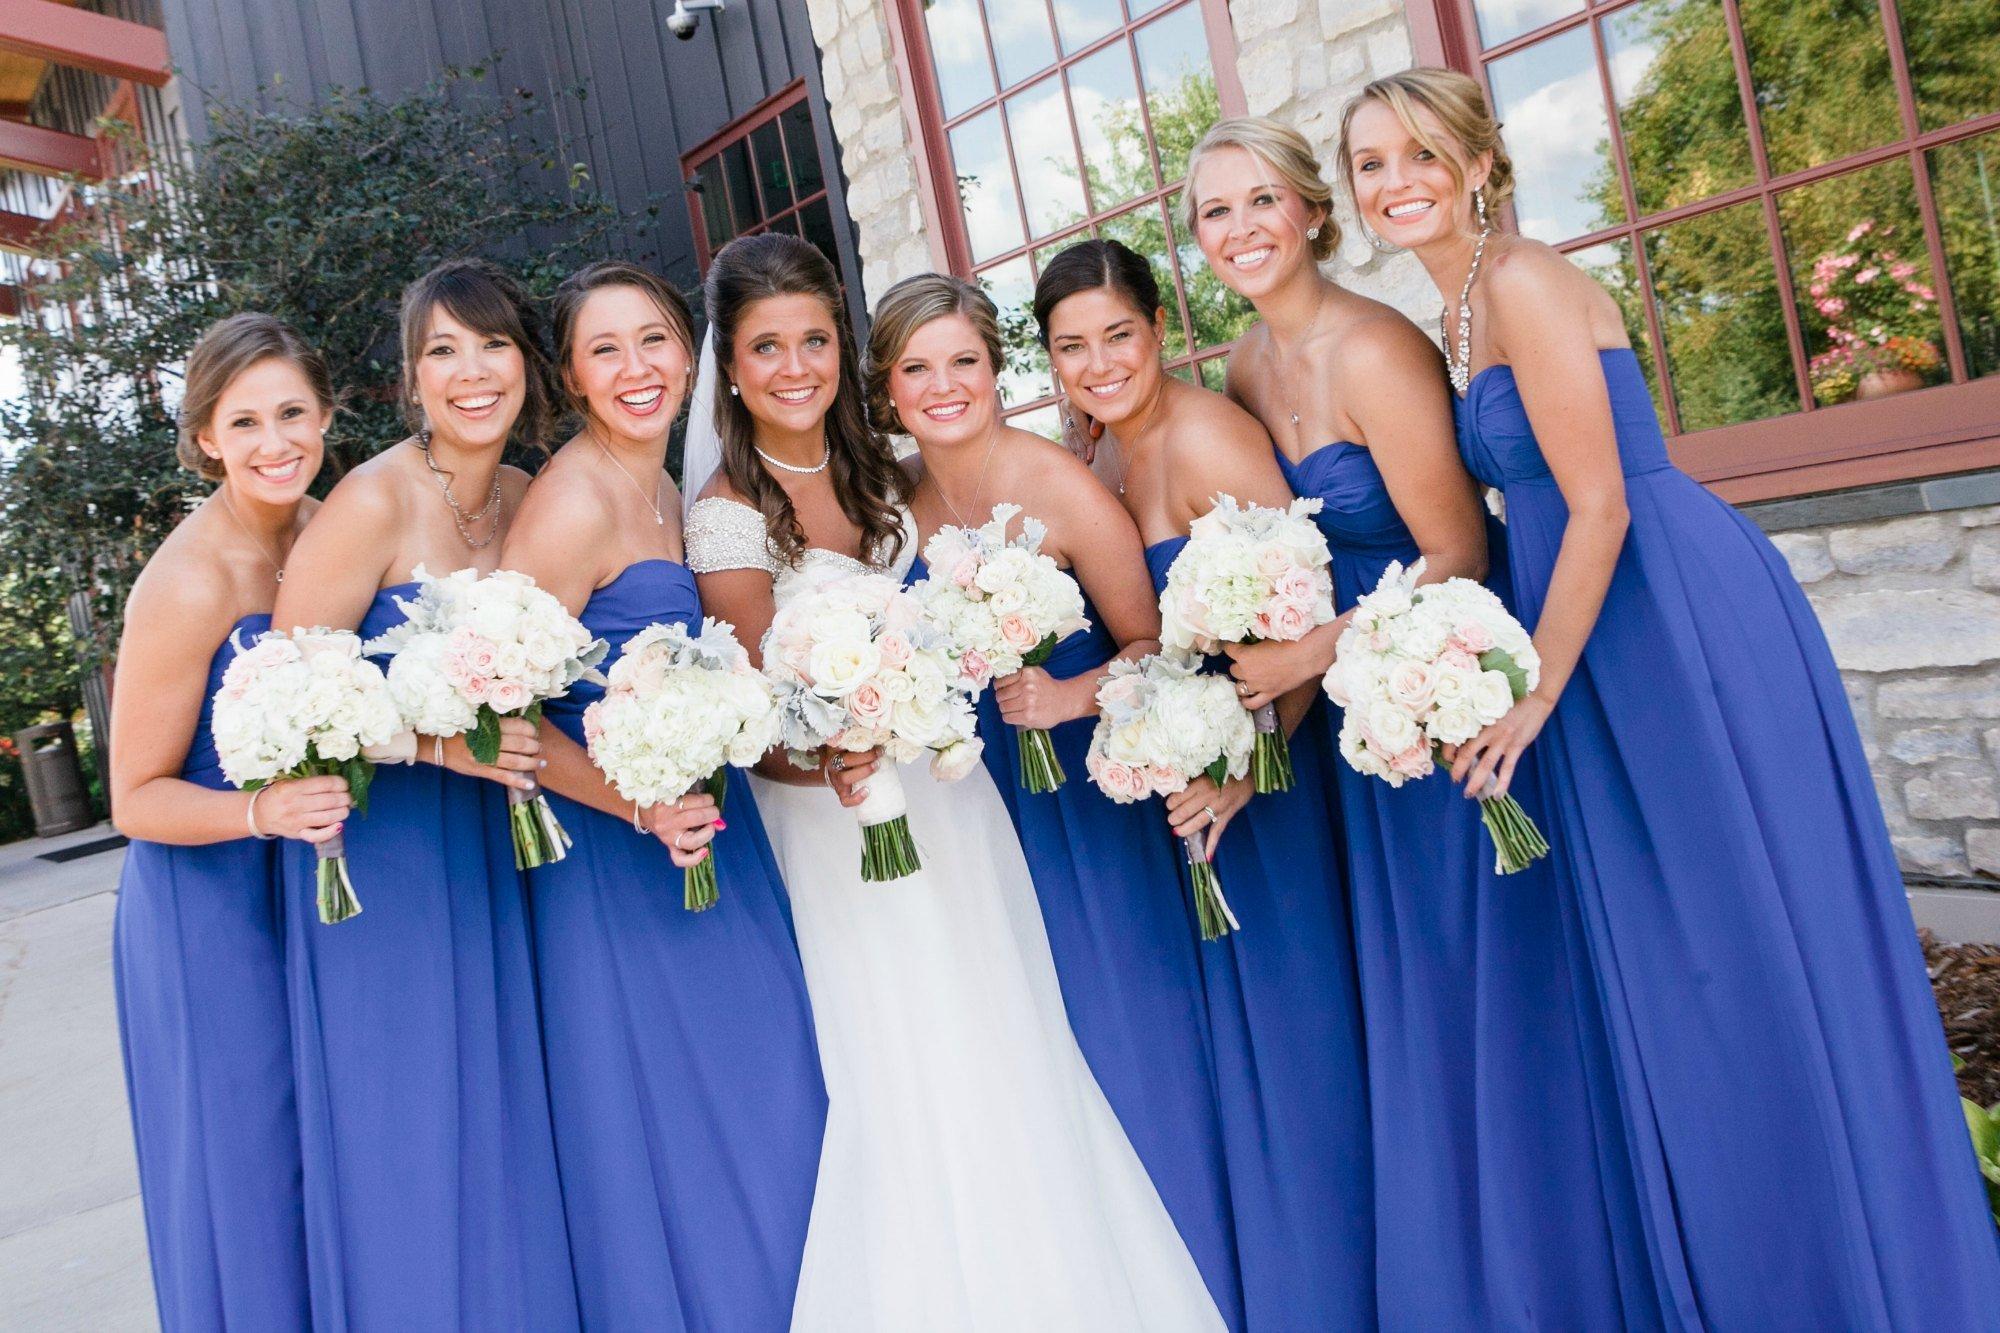 Bridal party before the wedding reception at Hazeltine National Golf Club